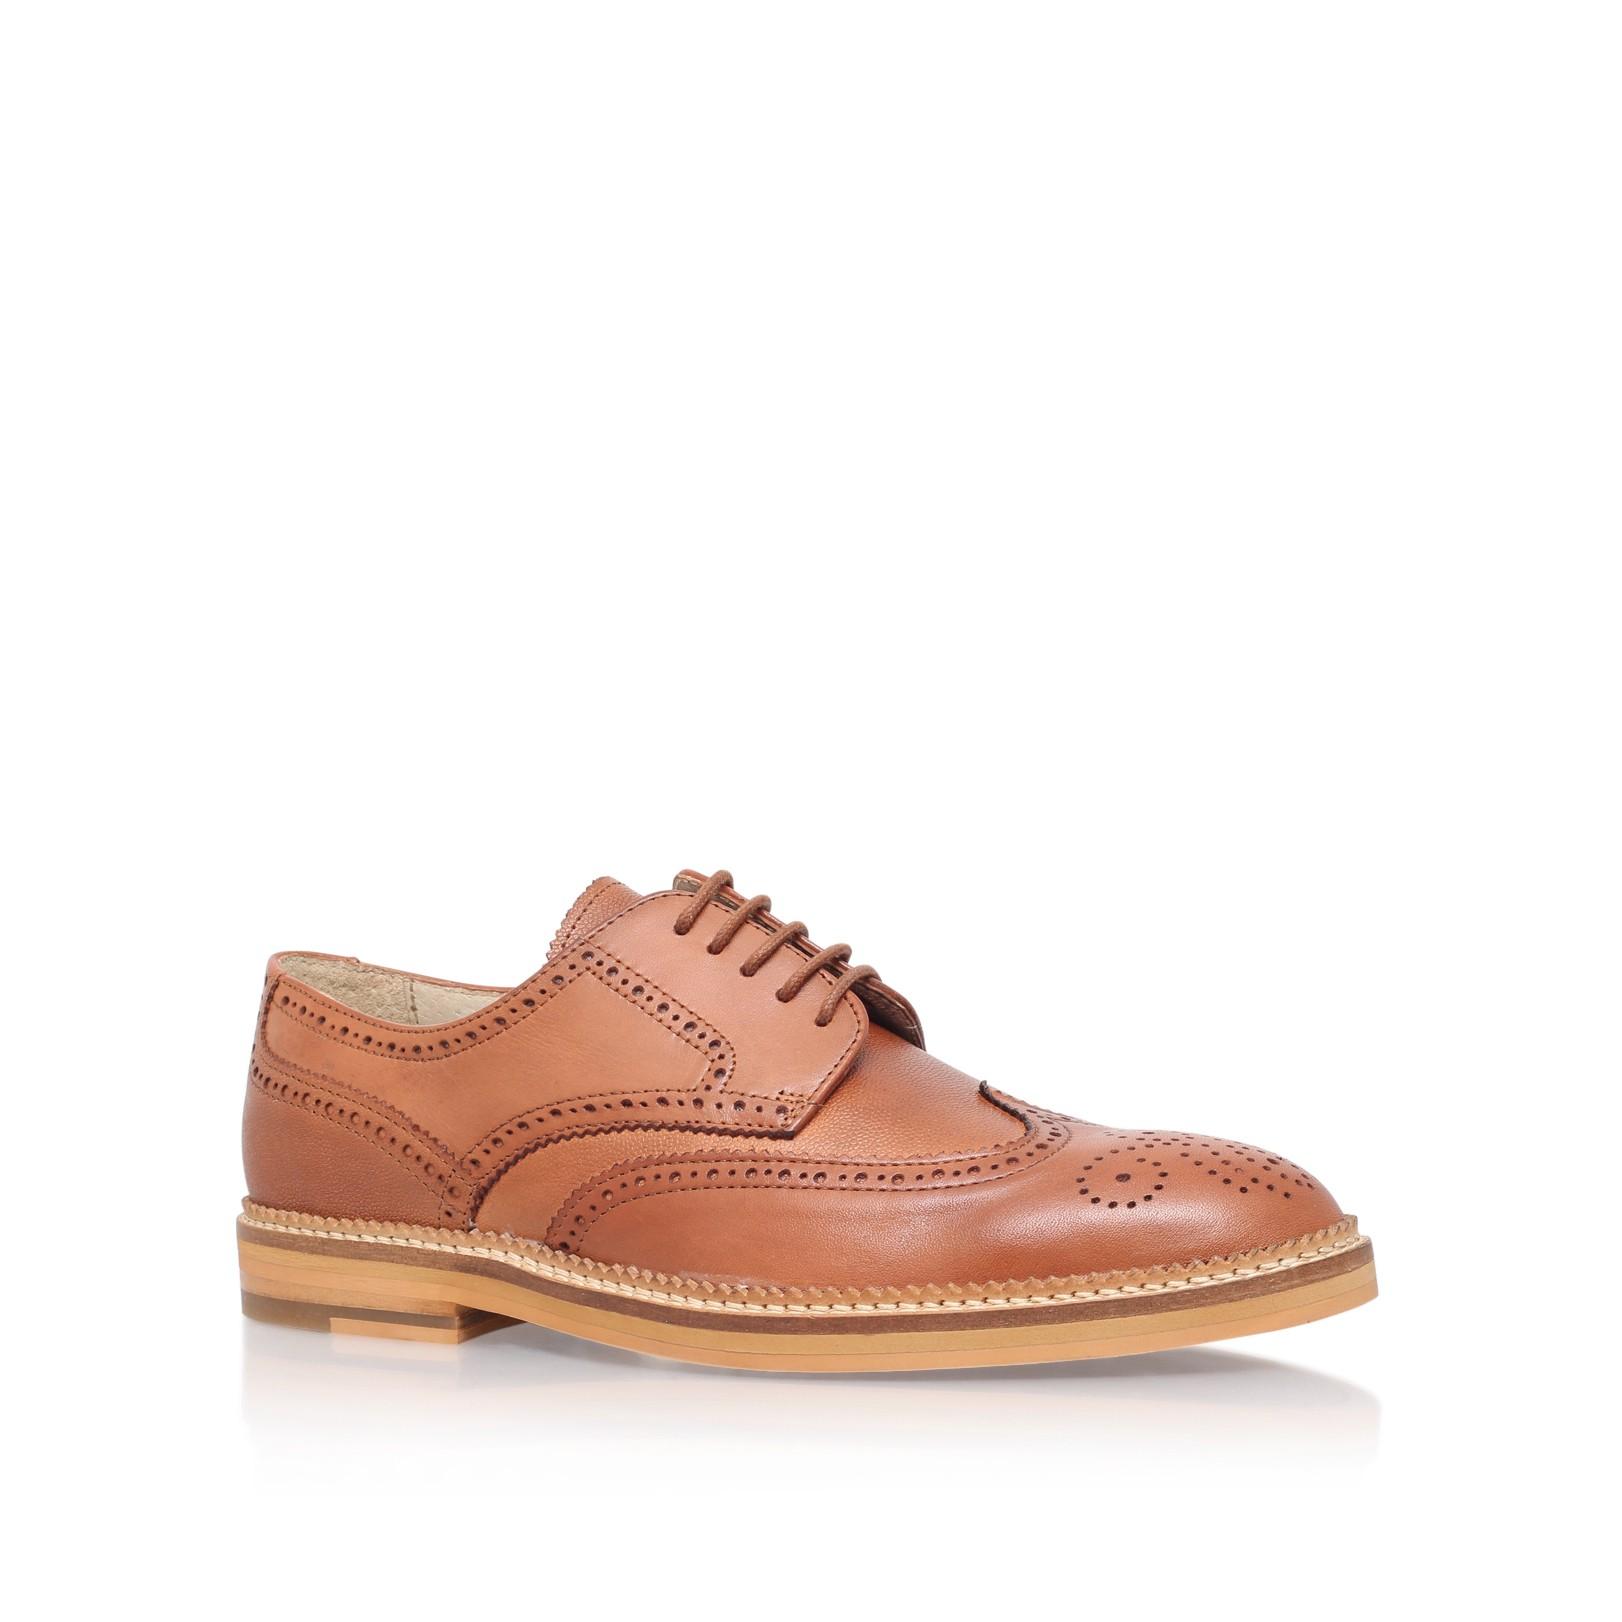 Portofino Shoes Canada